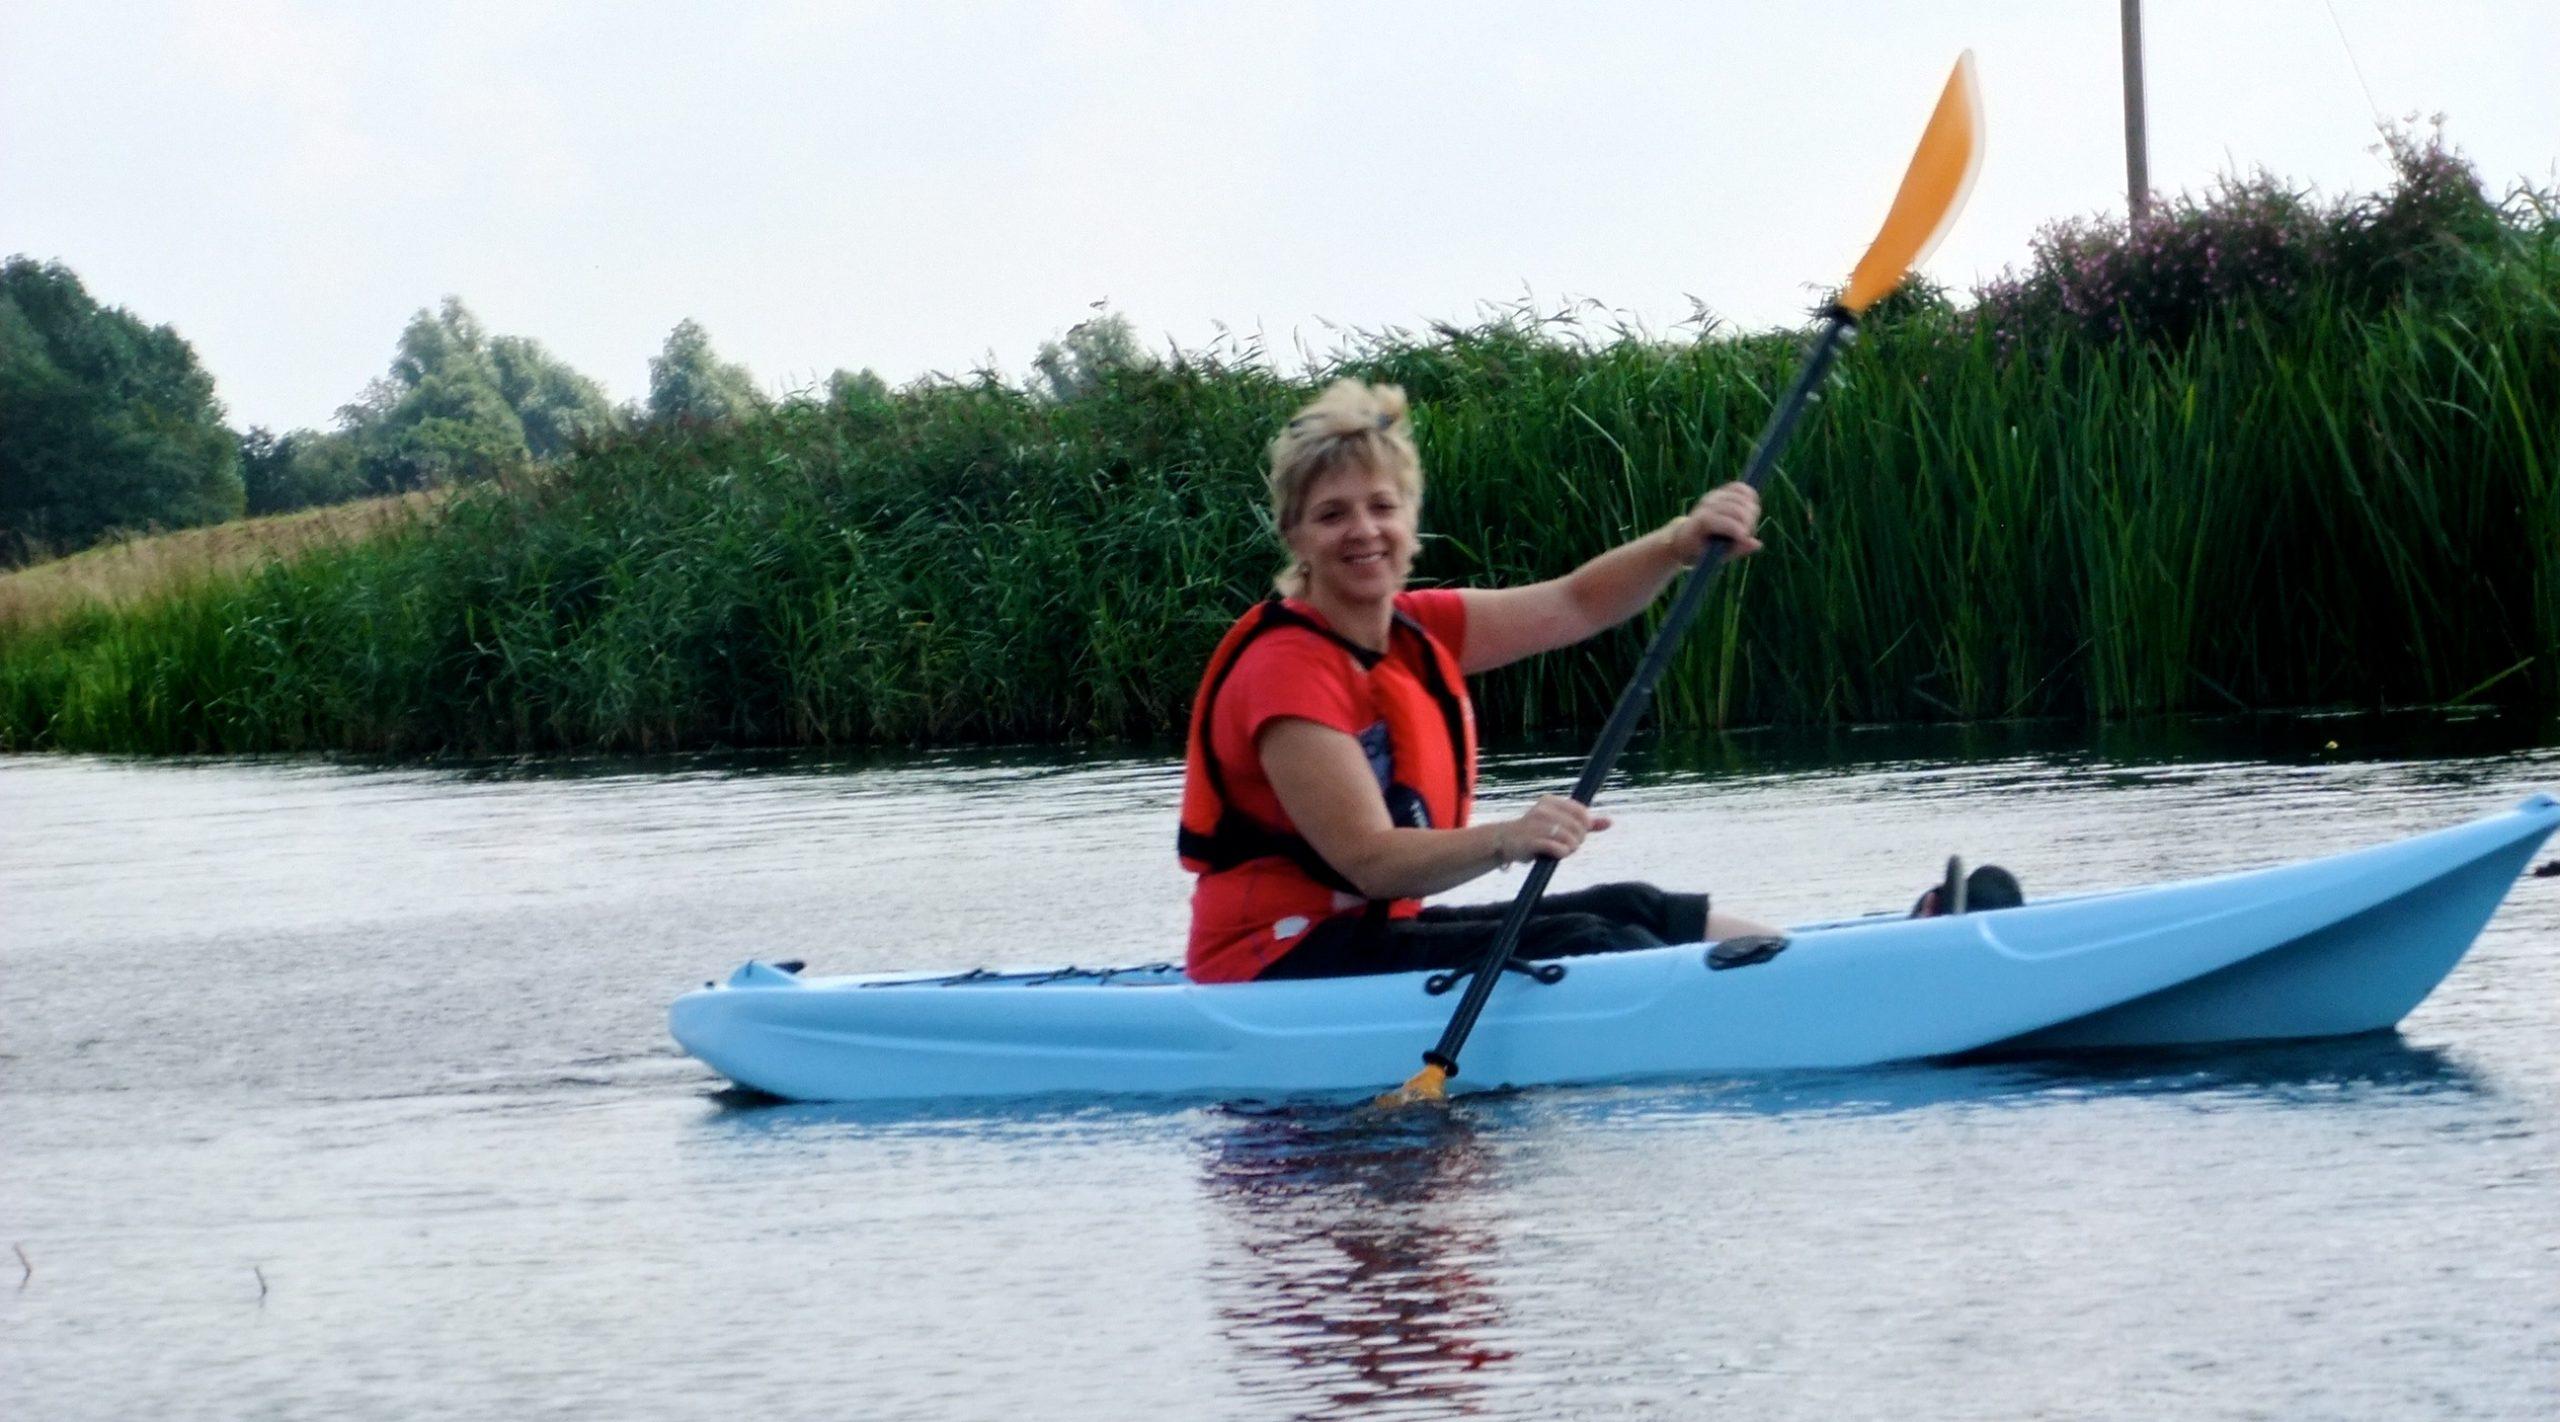 kayak hire in Cambridgeshire at Fourwinds Leisure